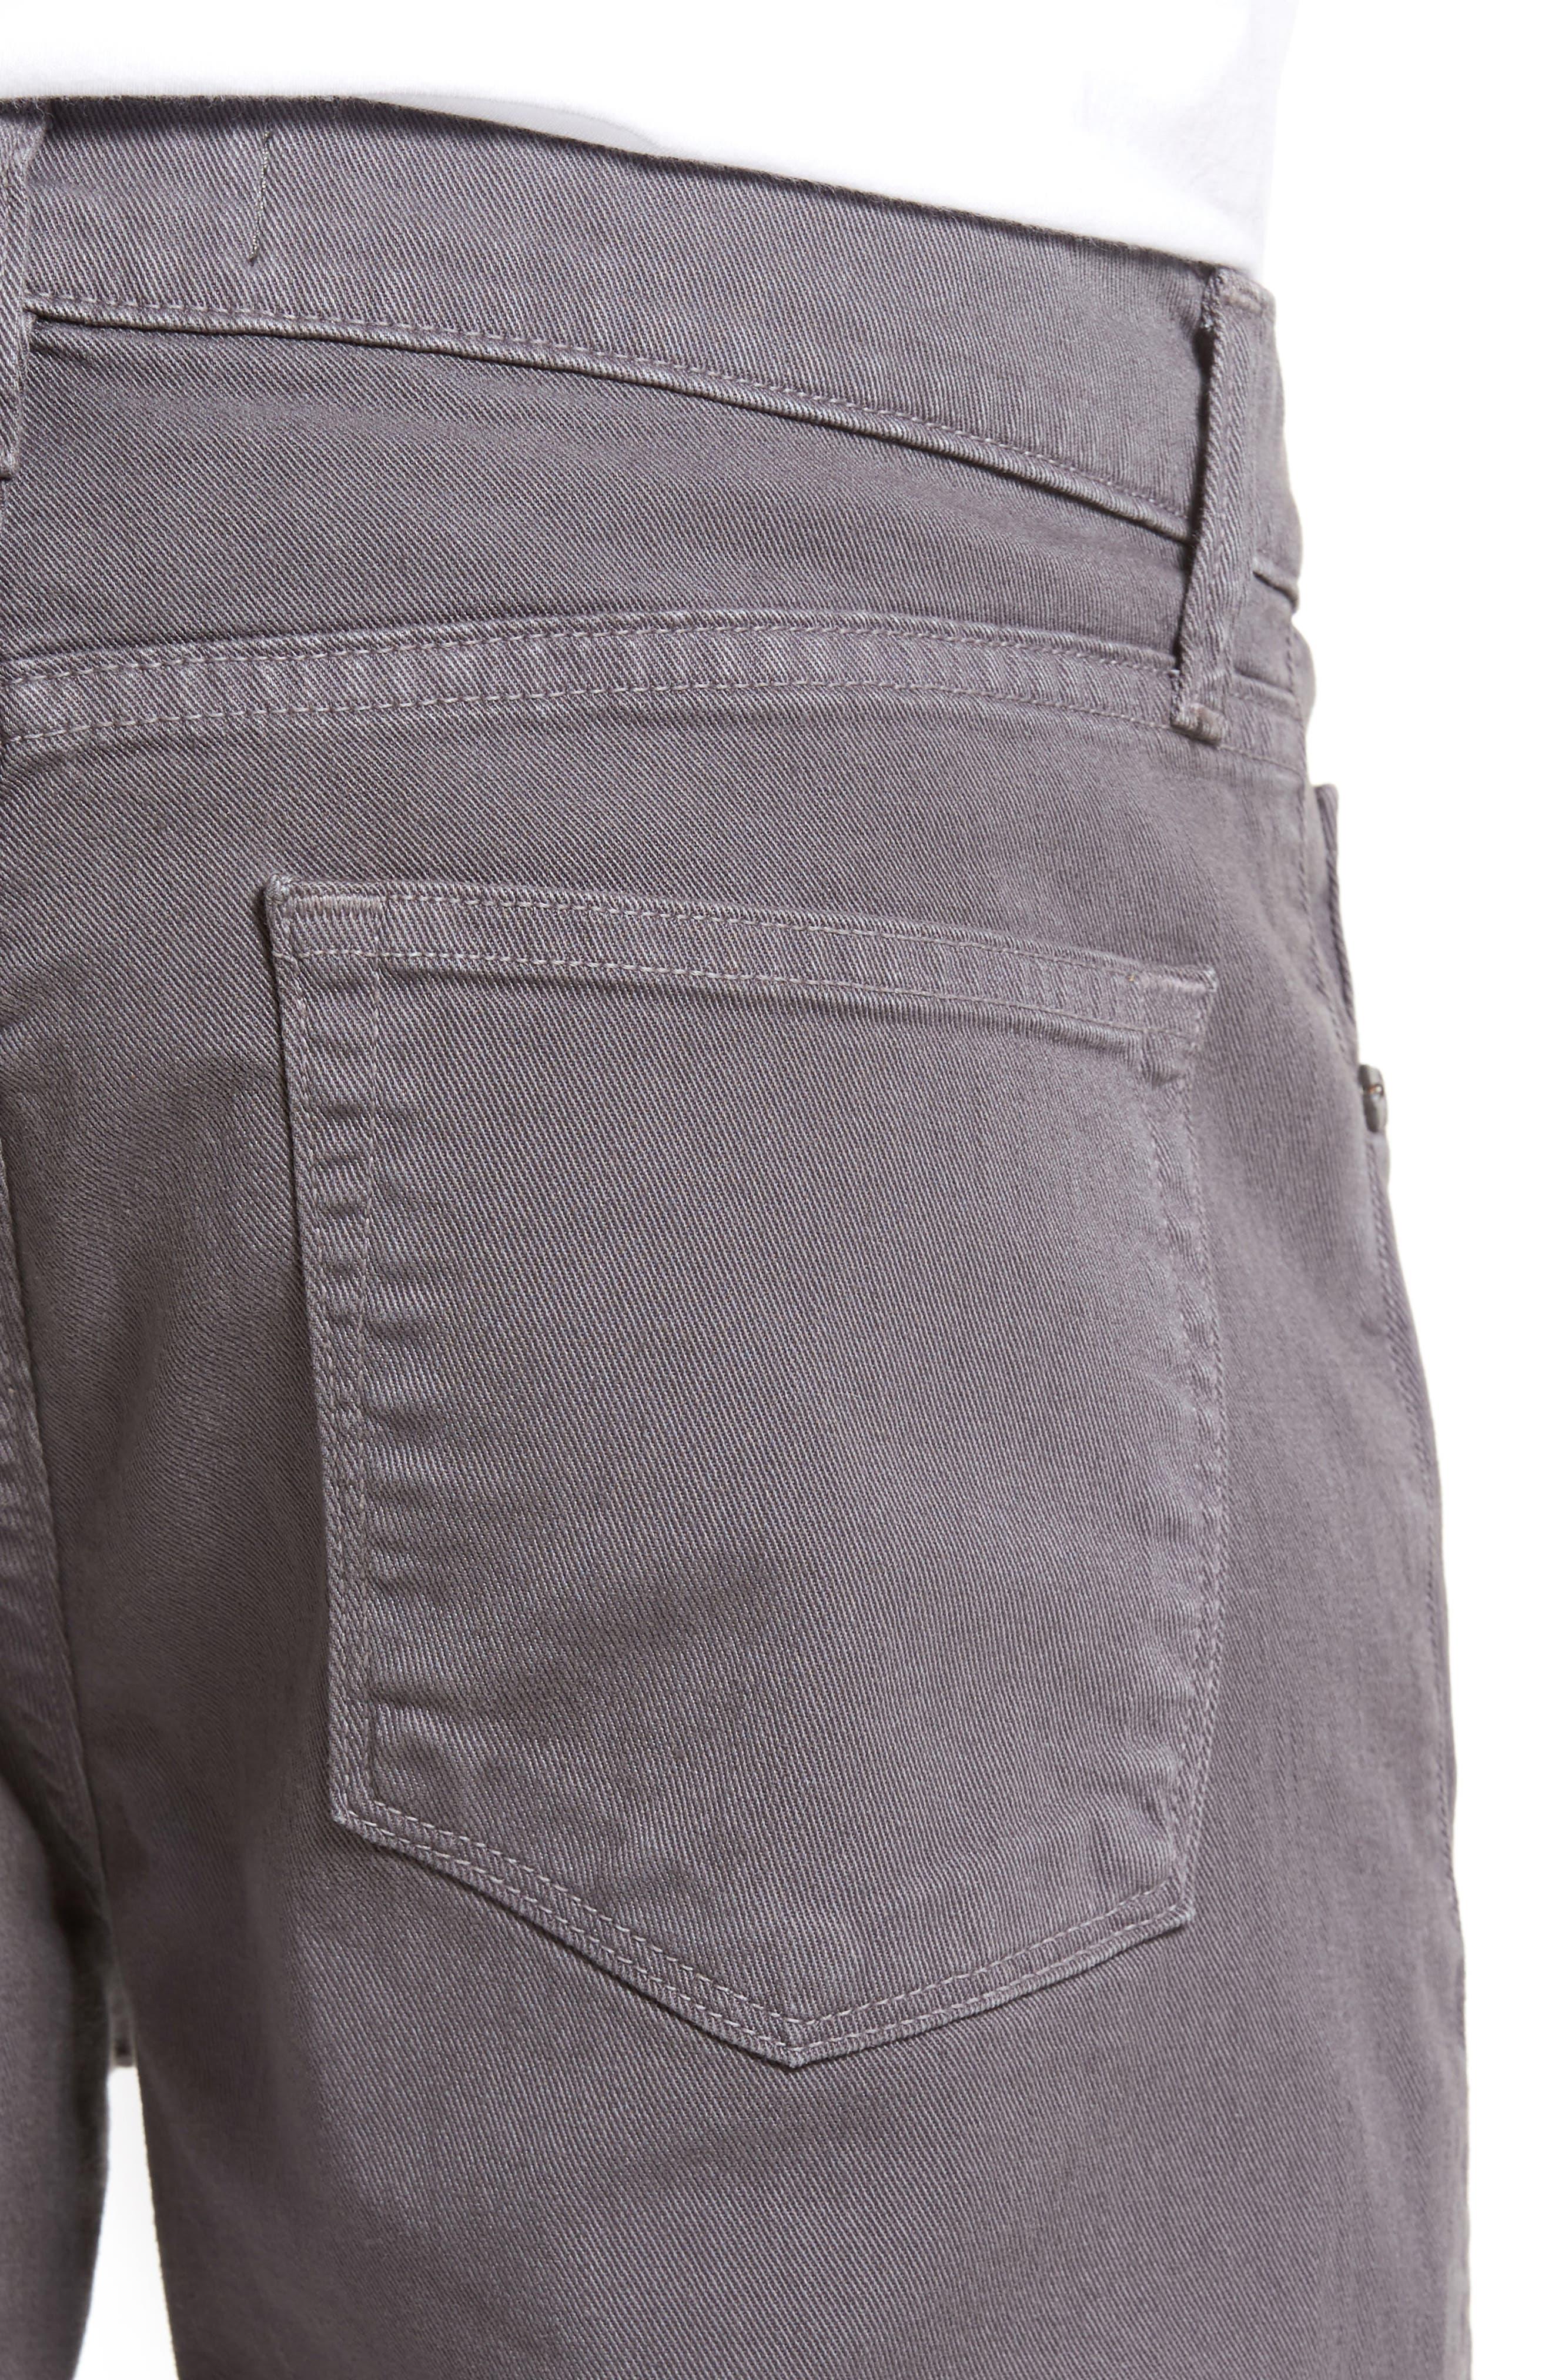 Tyler Slim Fit Jeans,                             Alternate thumbnail 4, color,                             Iron Gate